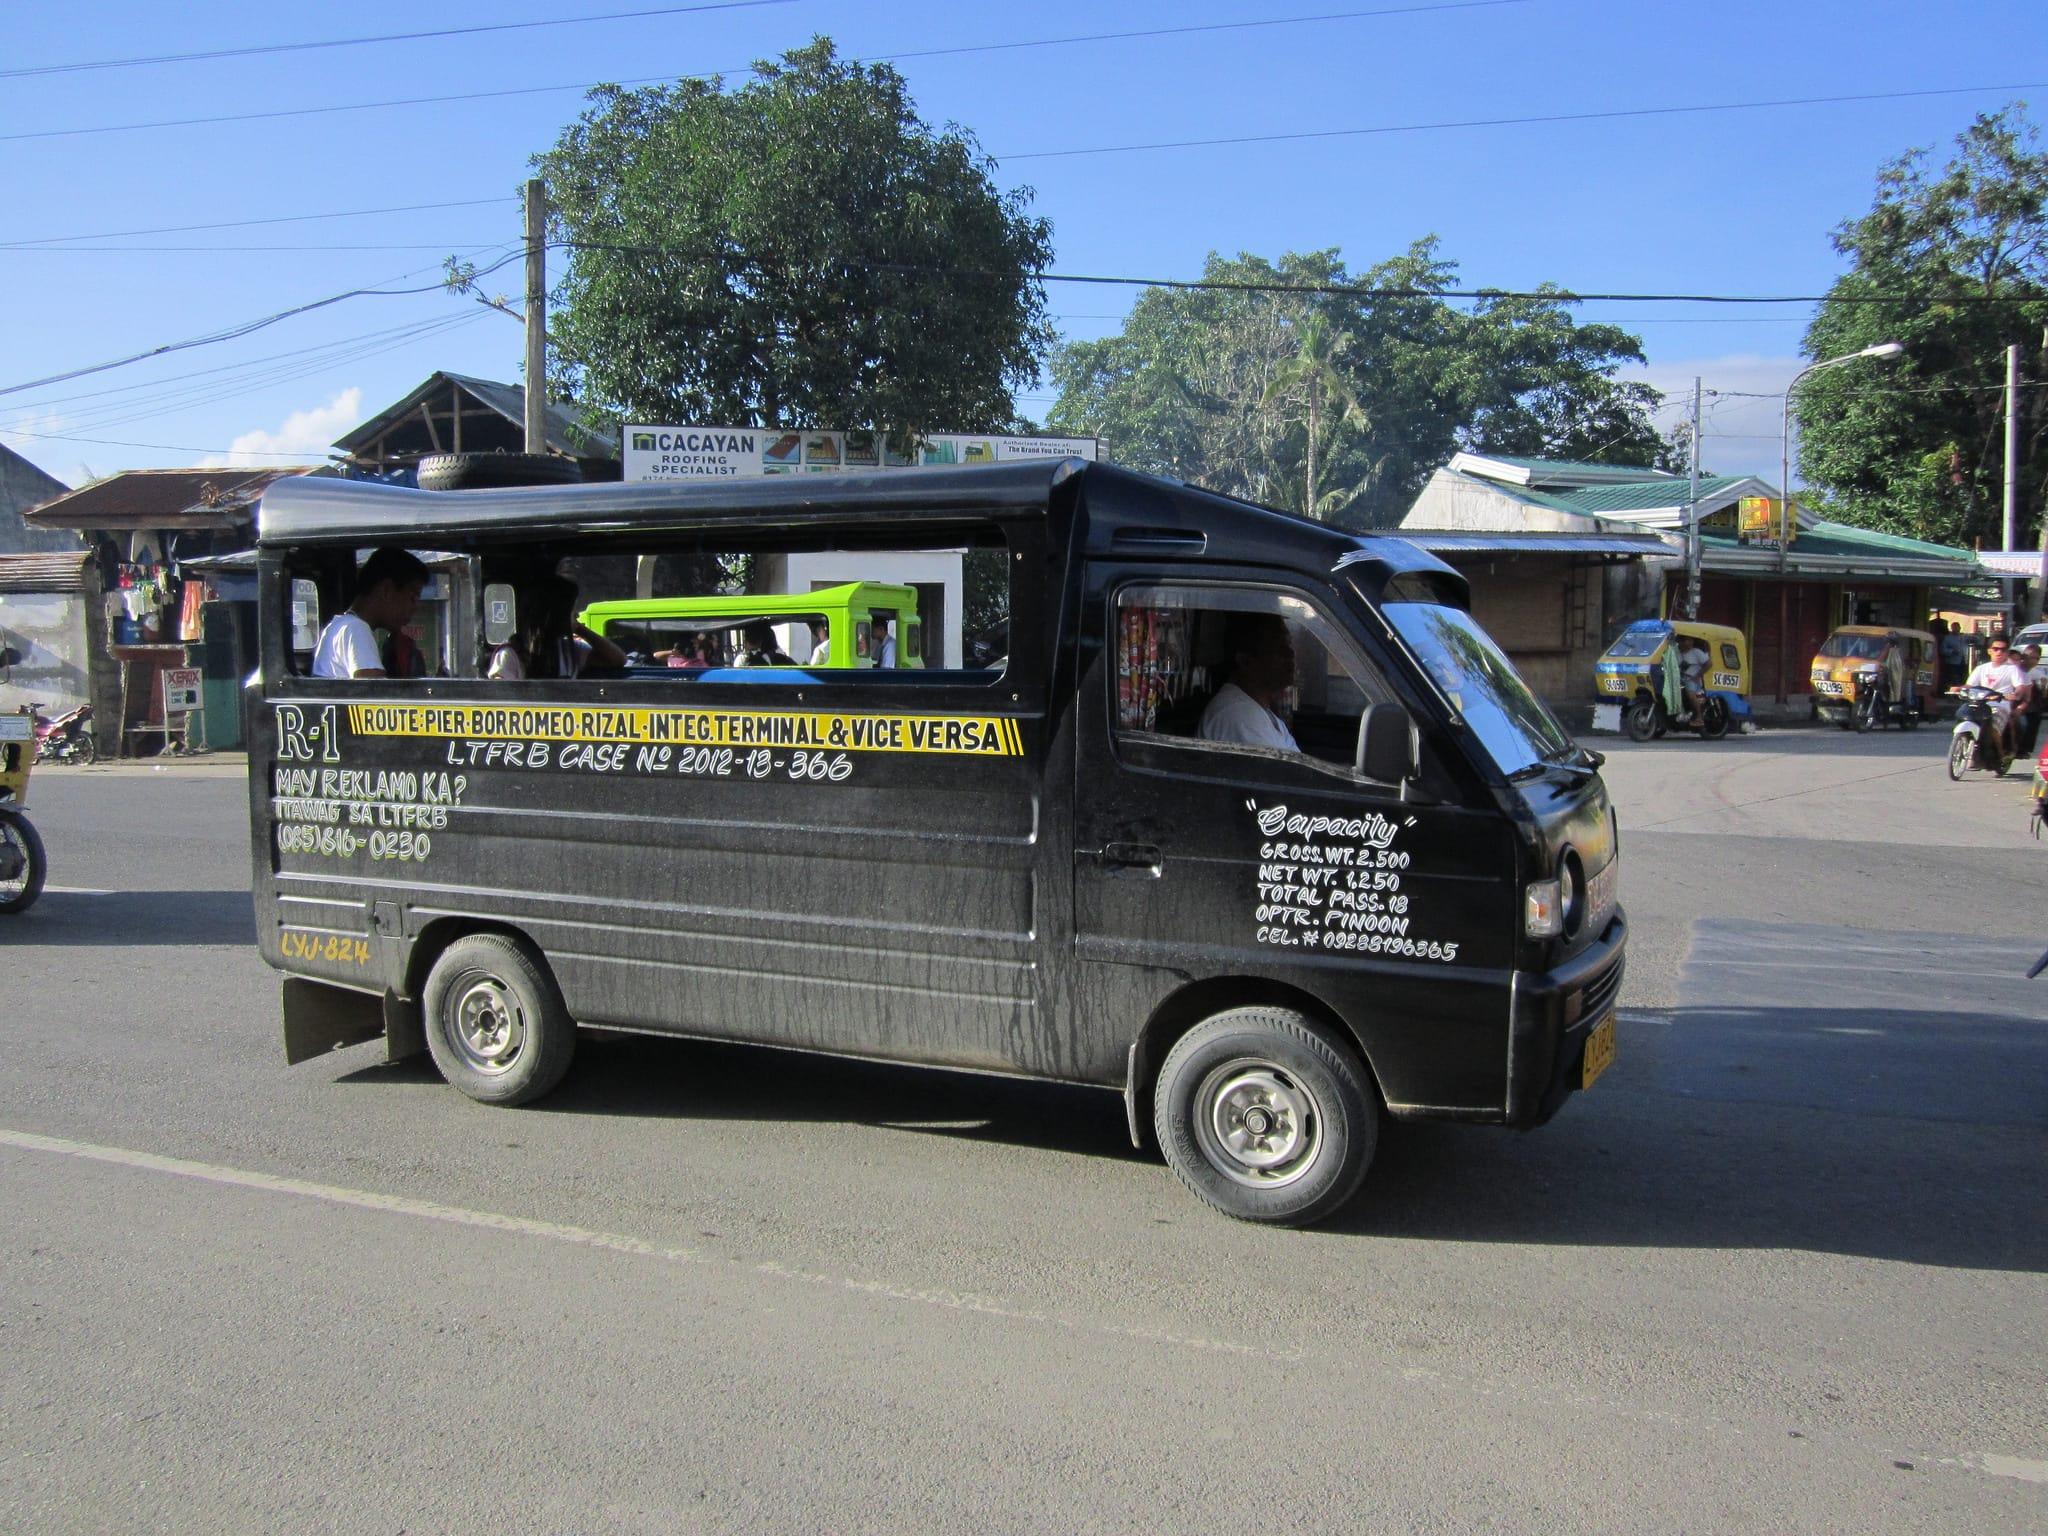 Surigao Tourist Spots, Transportation around Surigao, Surigao Travel Guide